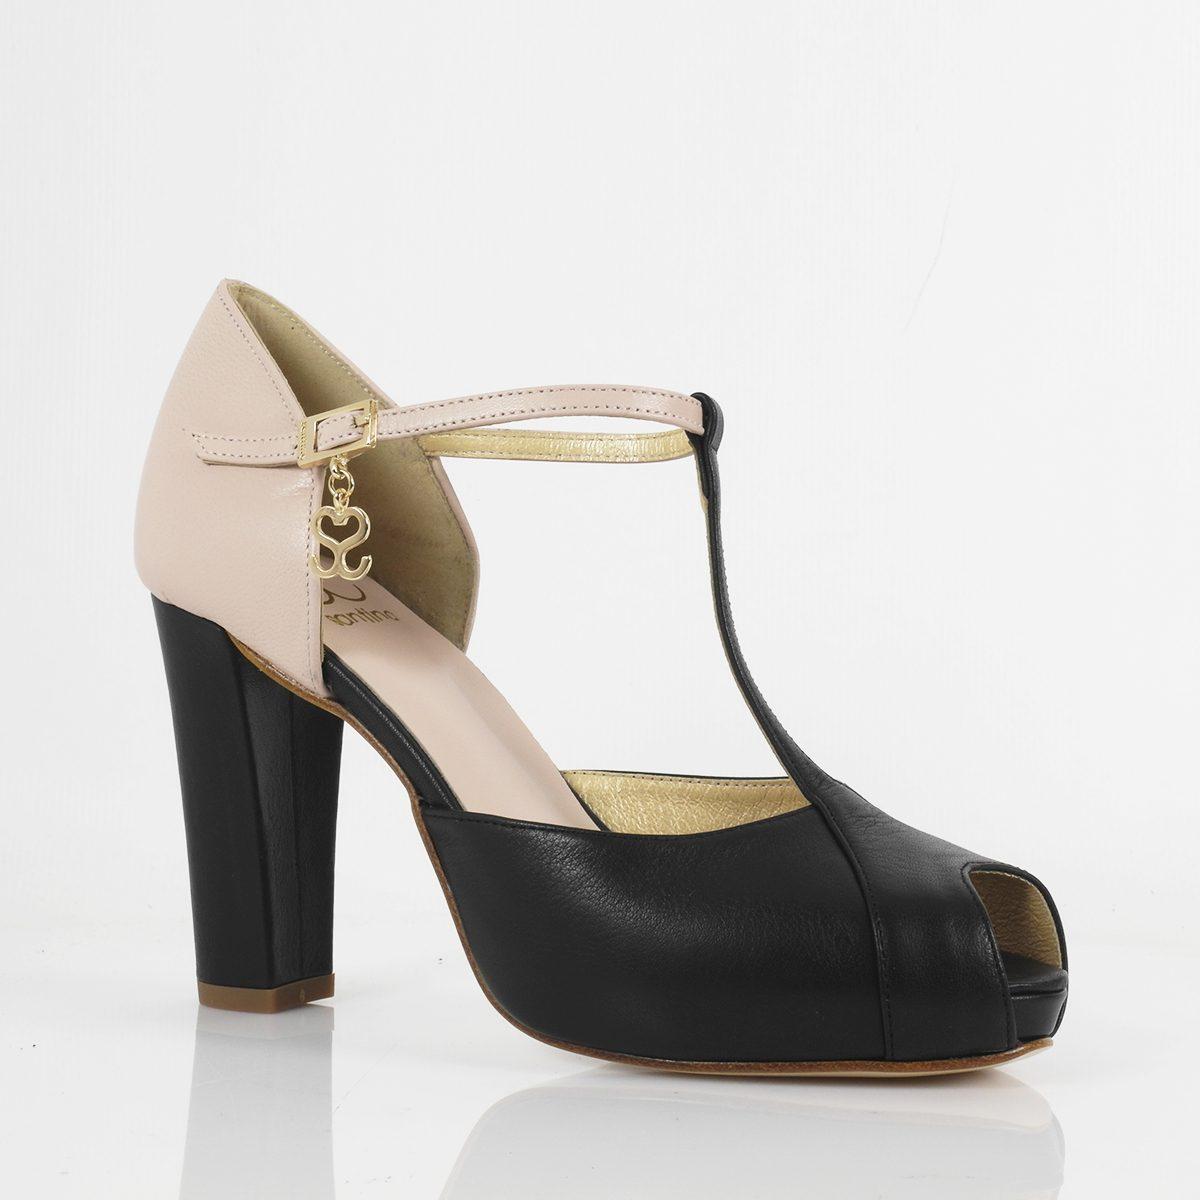 SANDALIA MOD.1637 (10cm) - Zapatos personalizados invitada